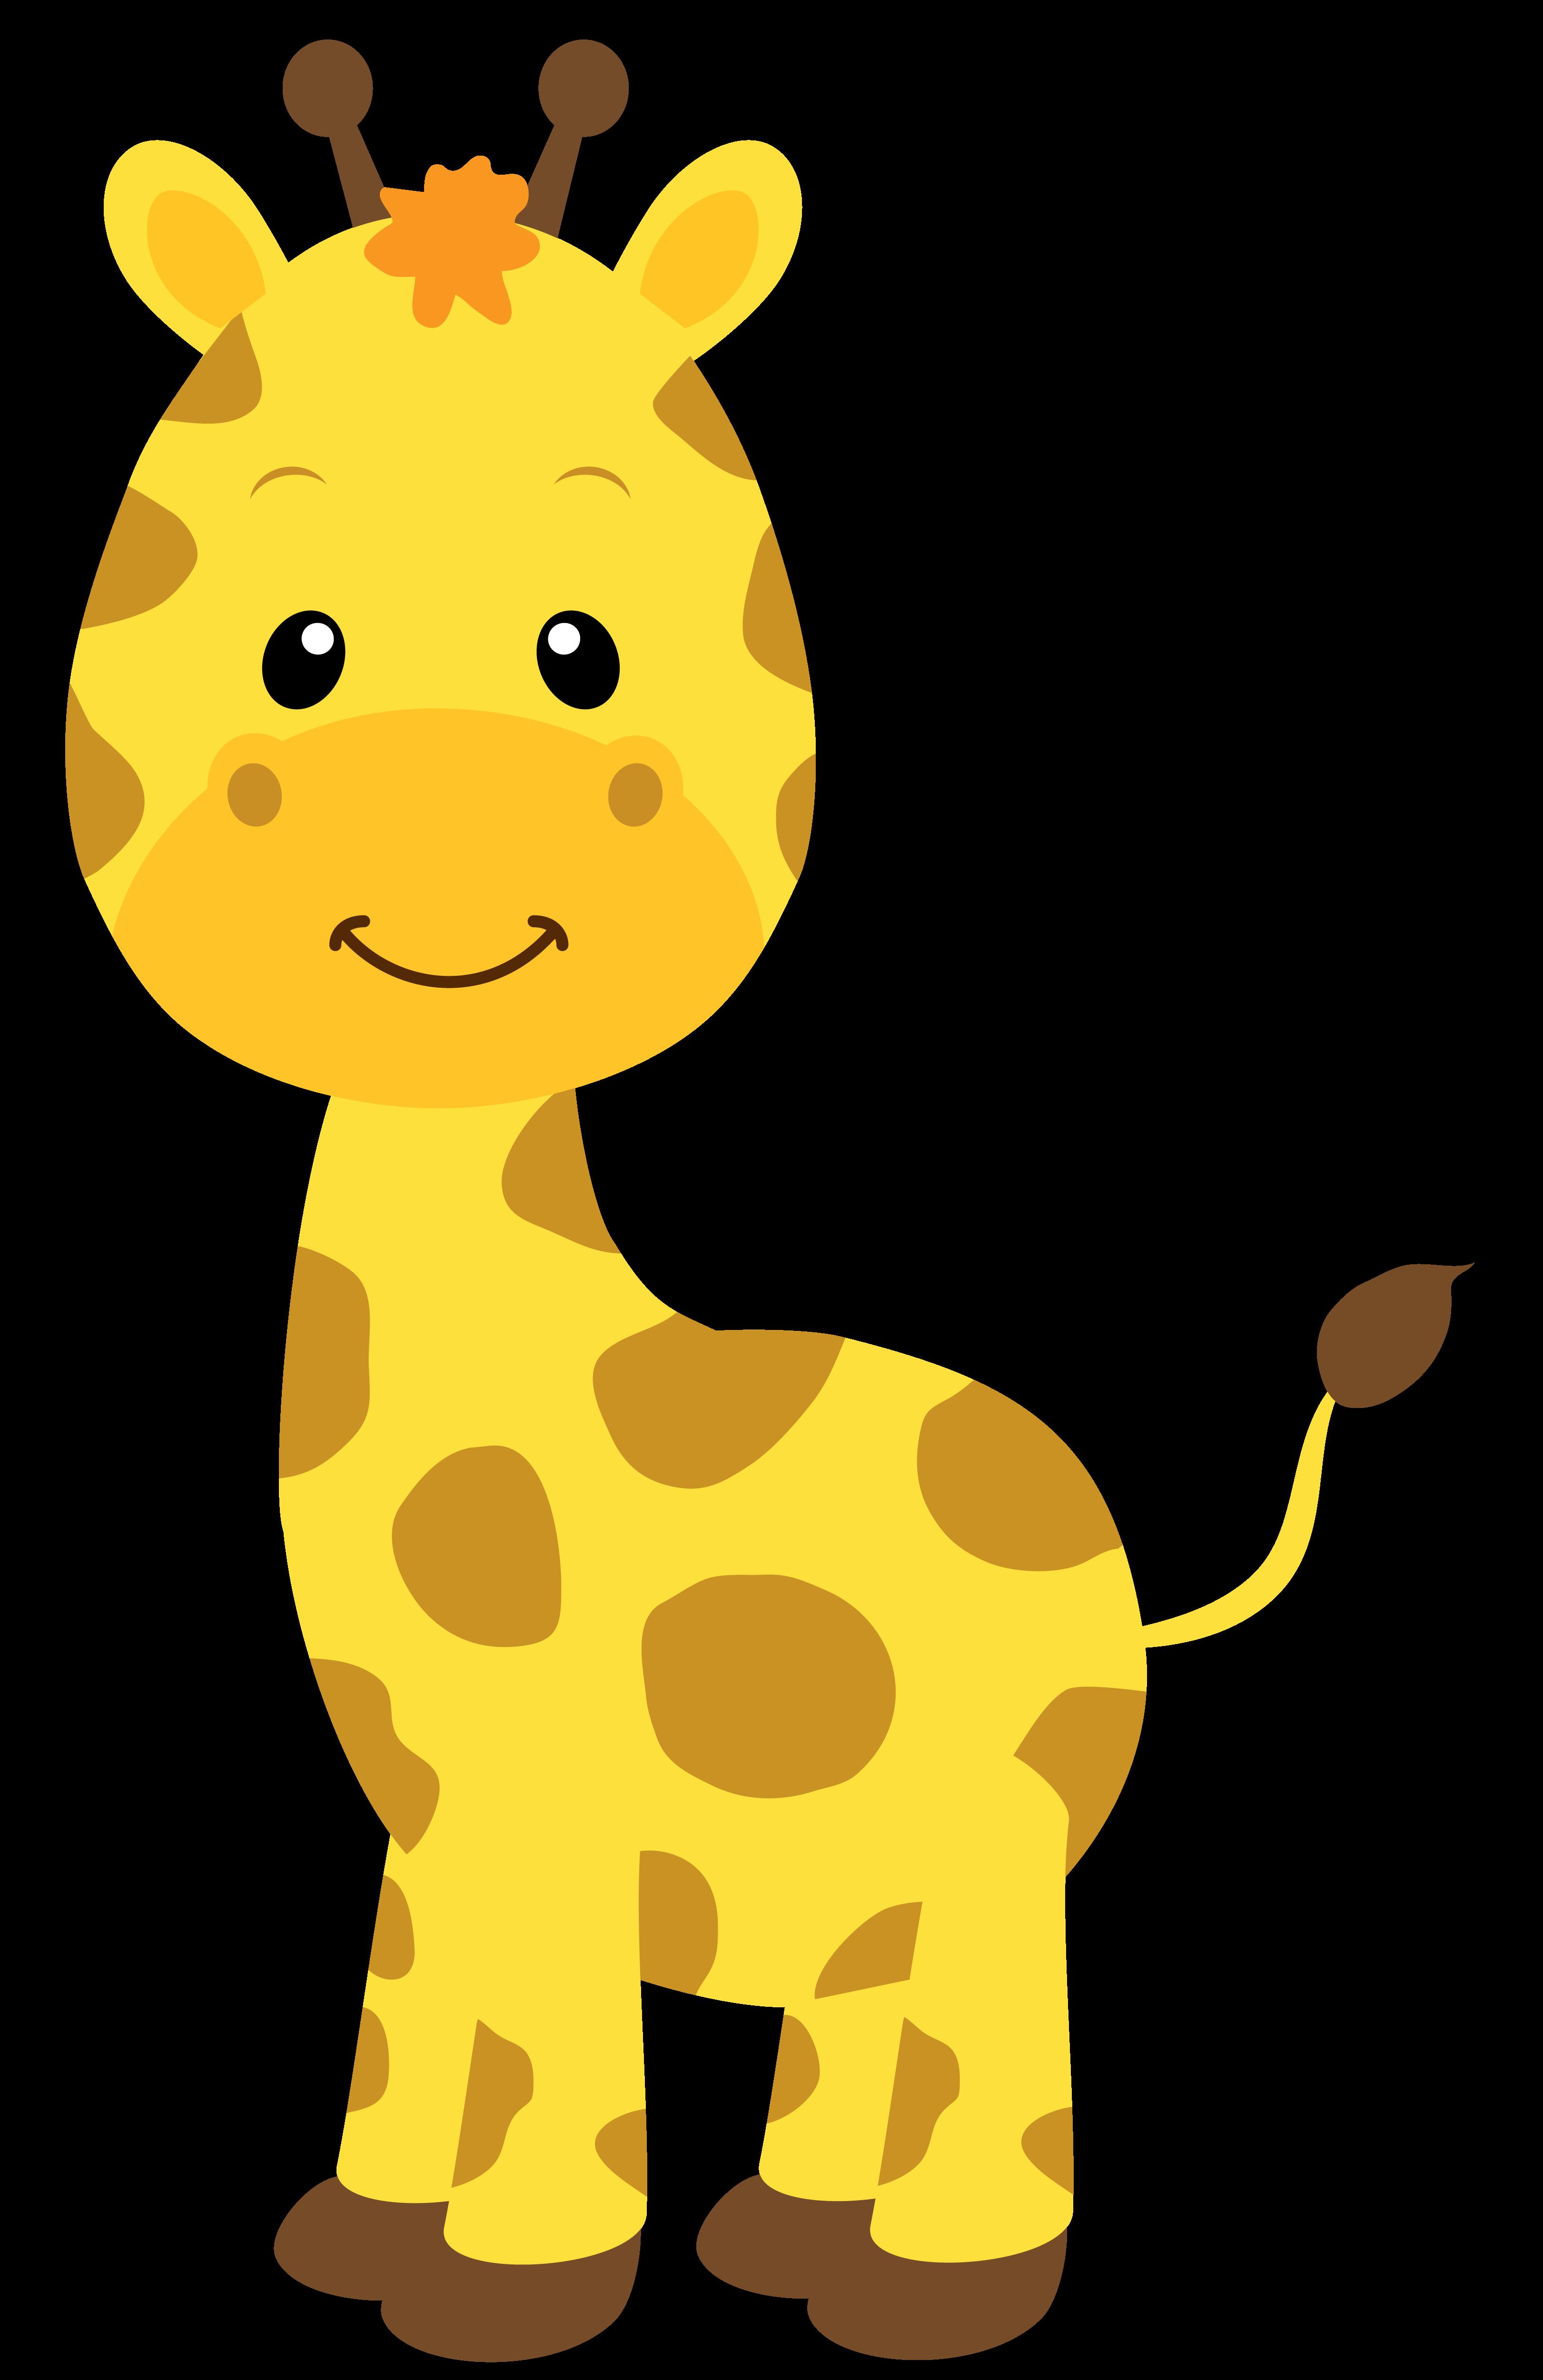 jirafa en alta resolucin y en vector en httpsmeganz